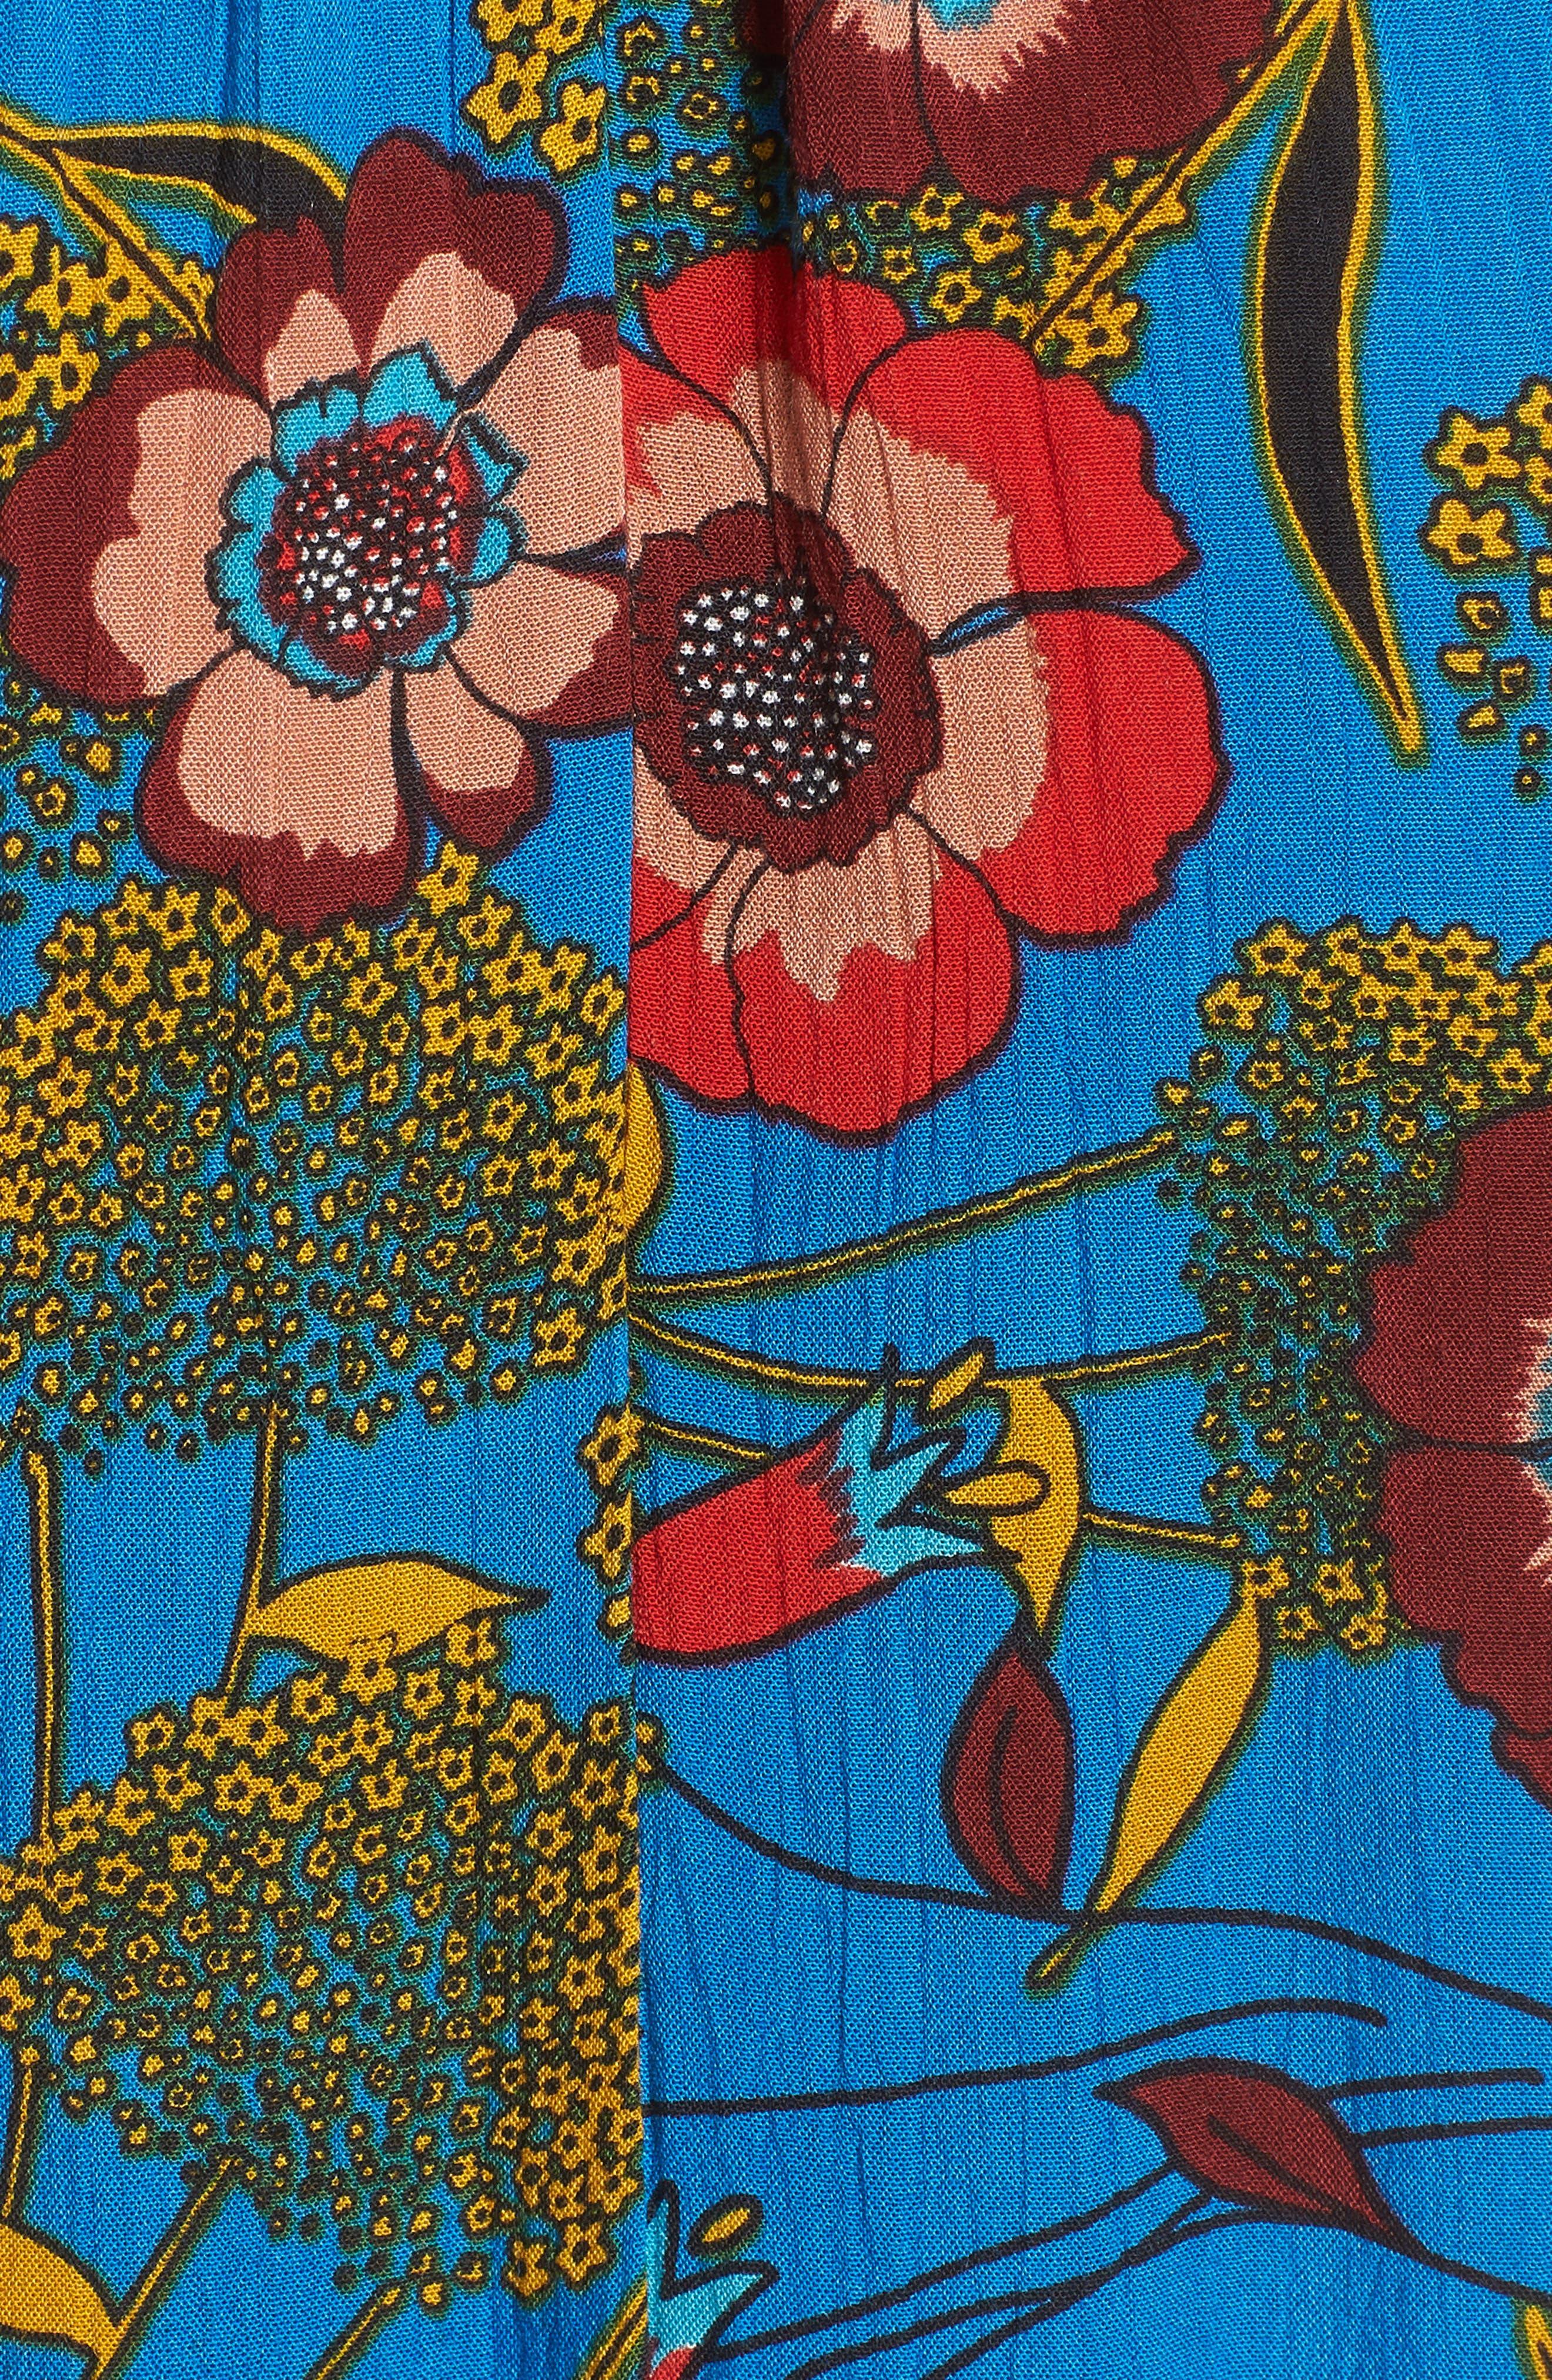 Heirloom Blossom Maxi Dress,                             Alternate thumbnail 6, color,                             Royal/ Blue/ Red